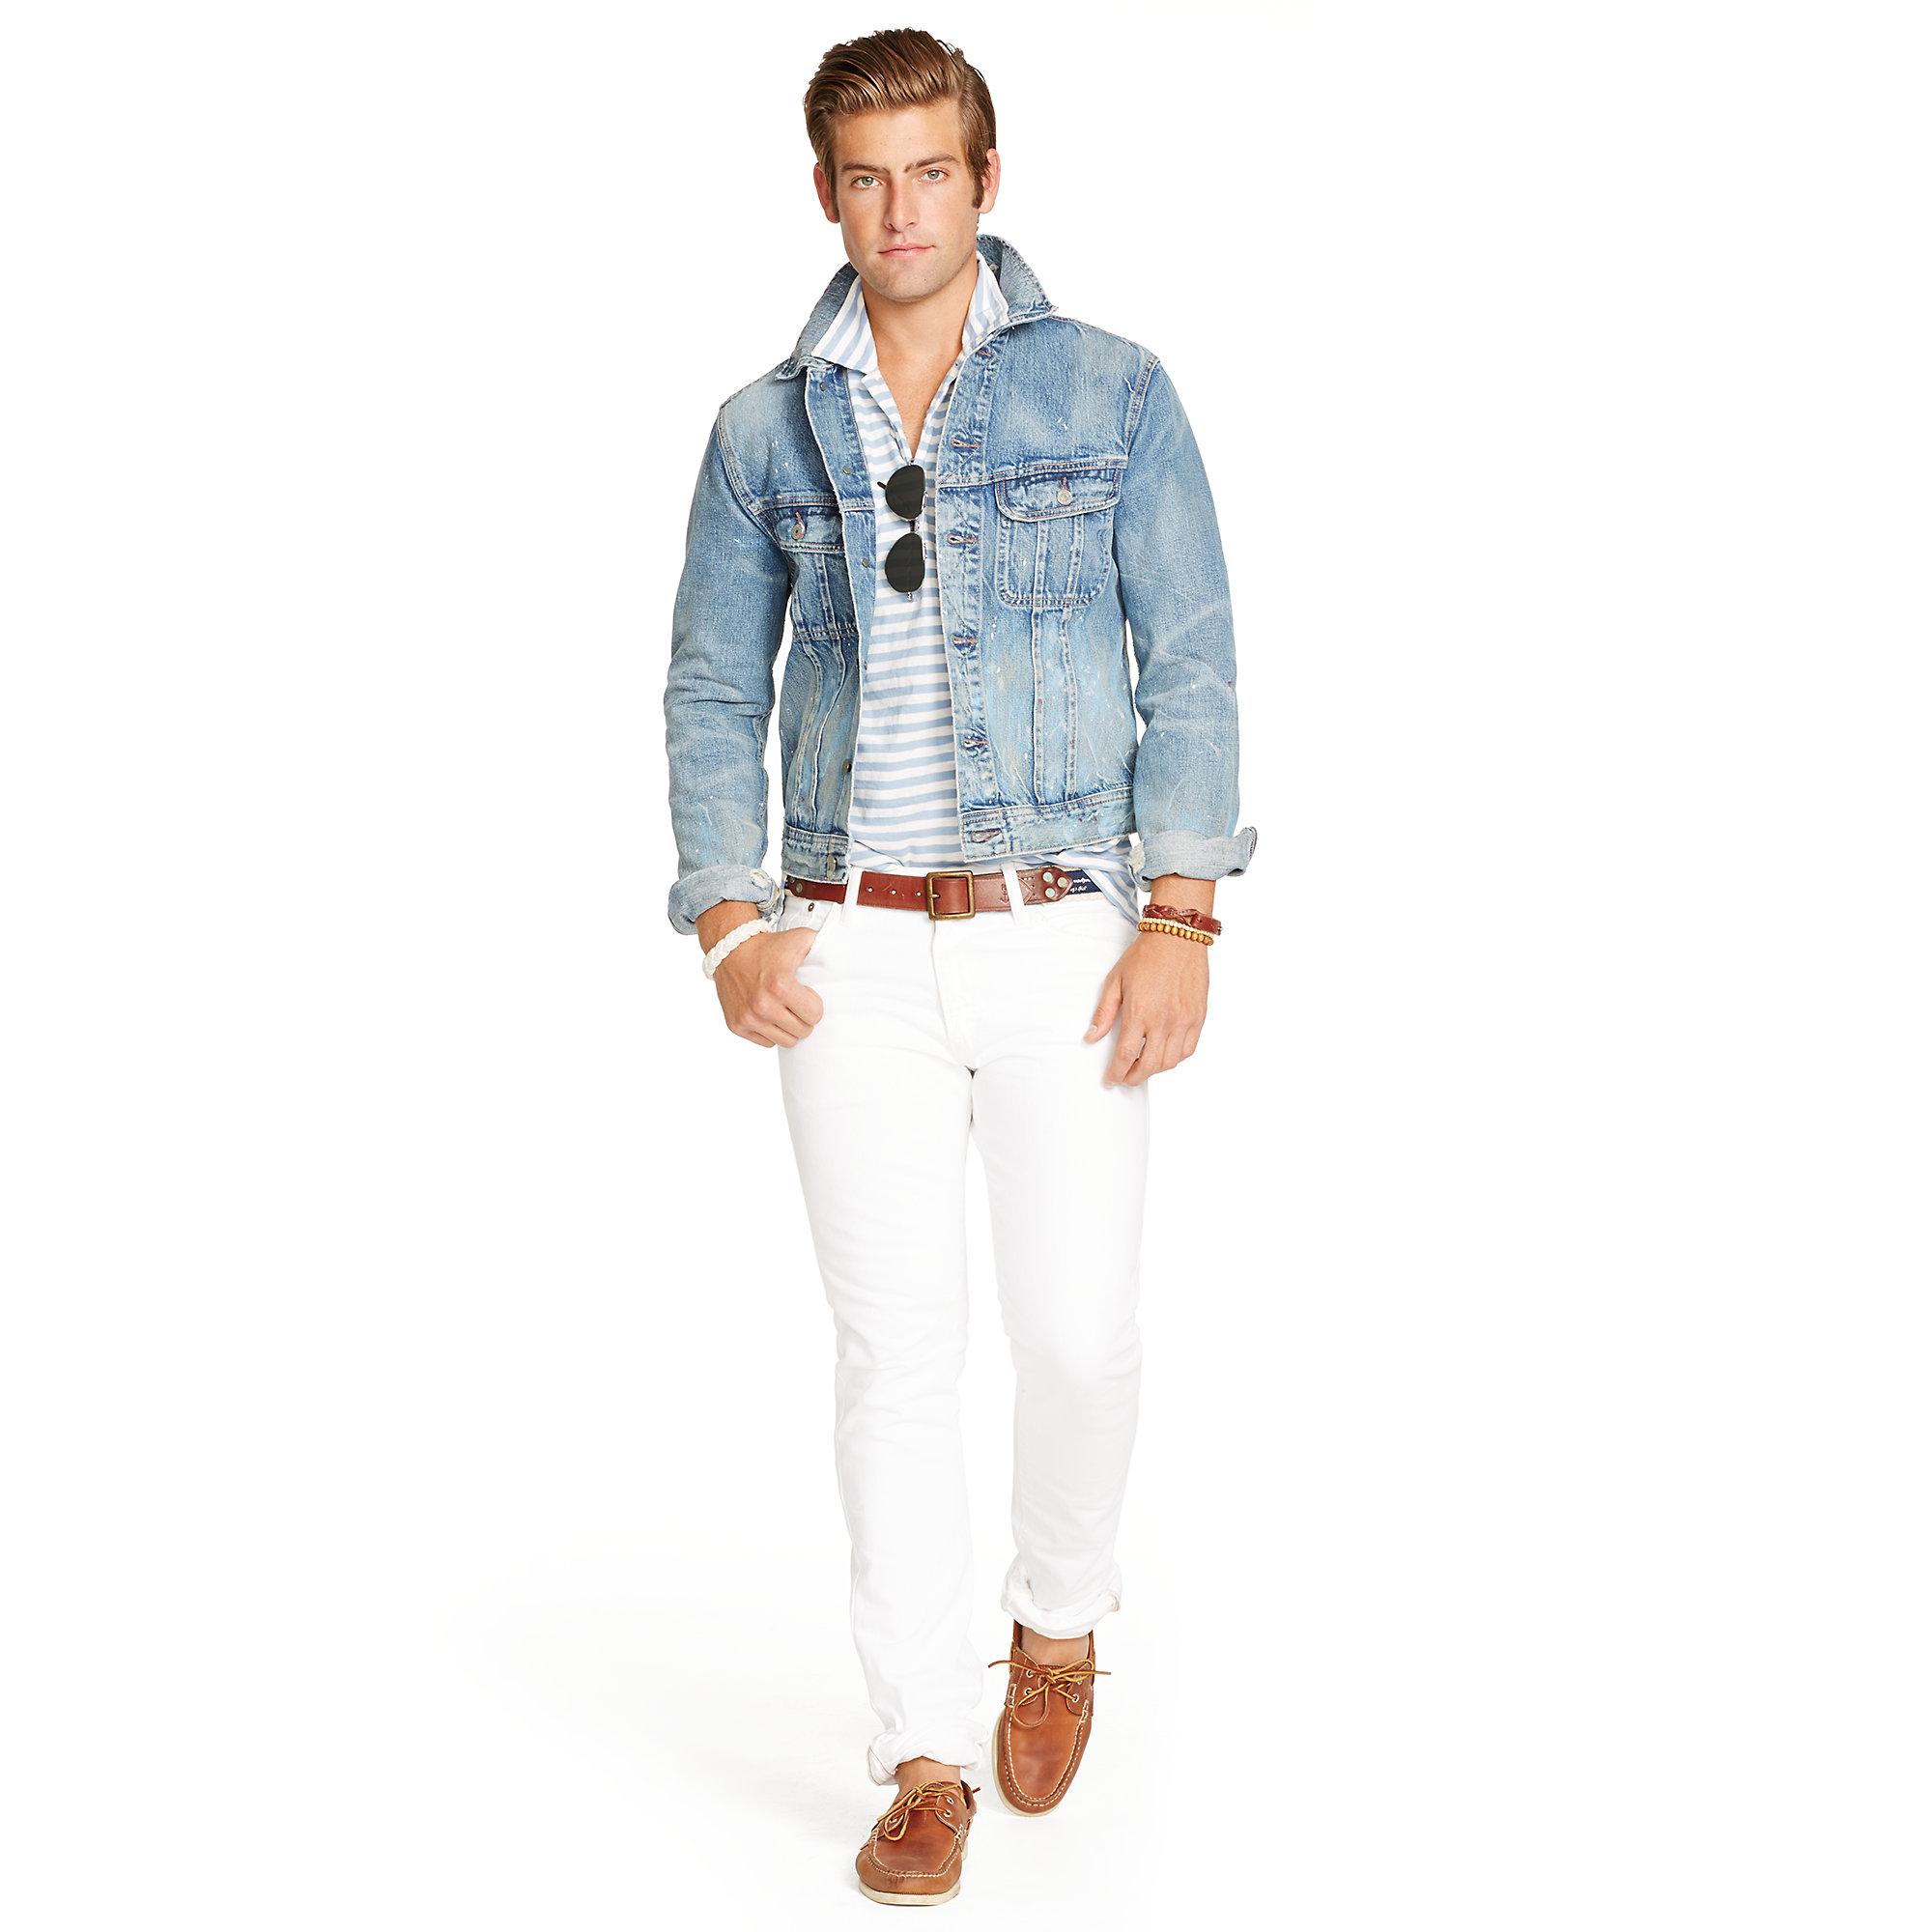 Polo Ralph Lauren Distressed Denim Jacket In Blue For Men